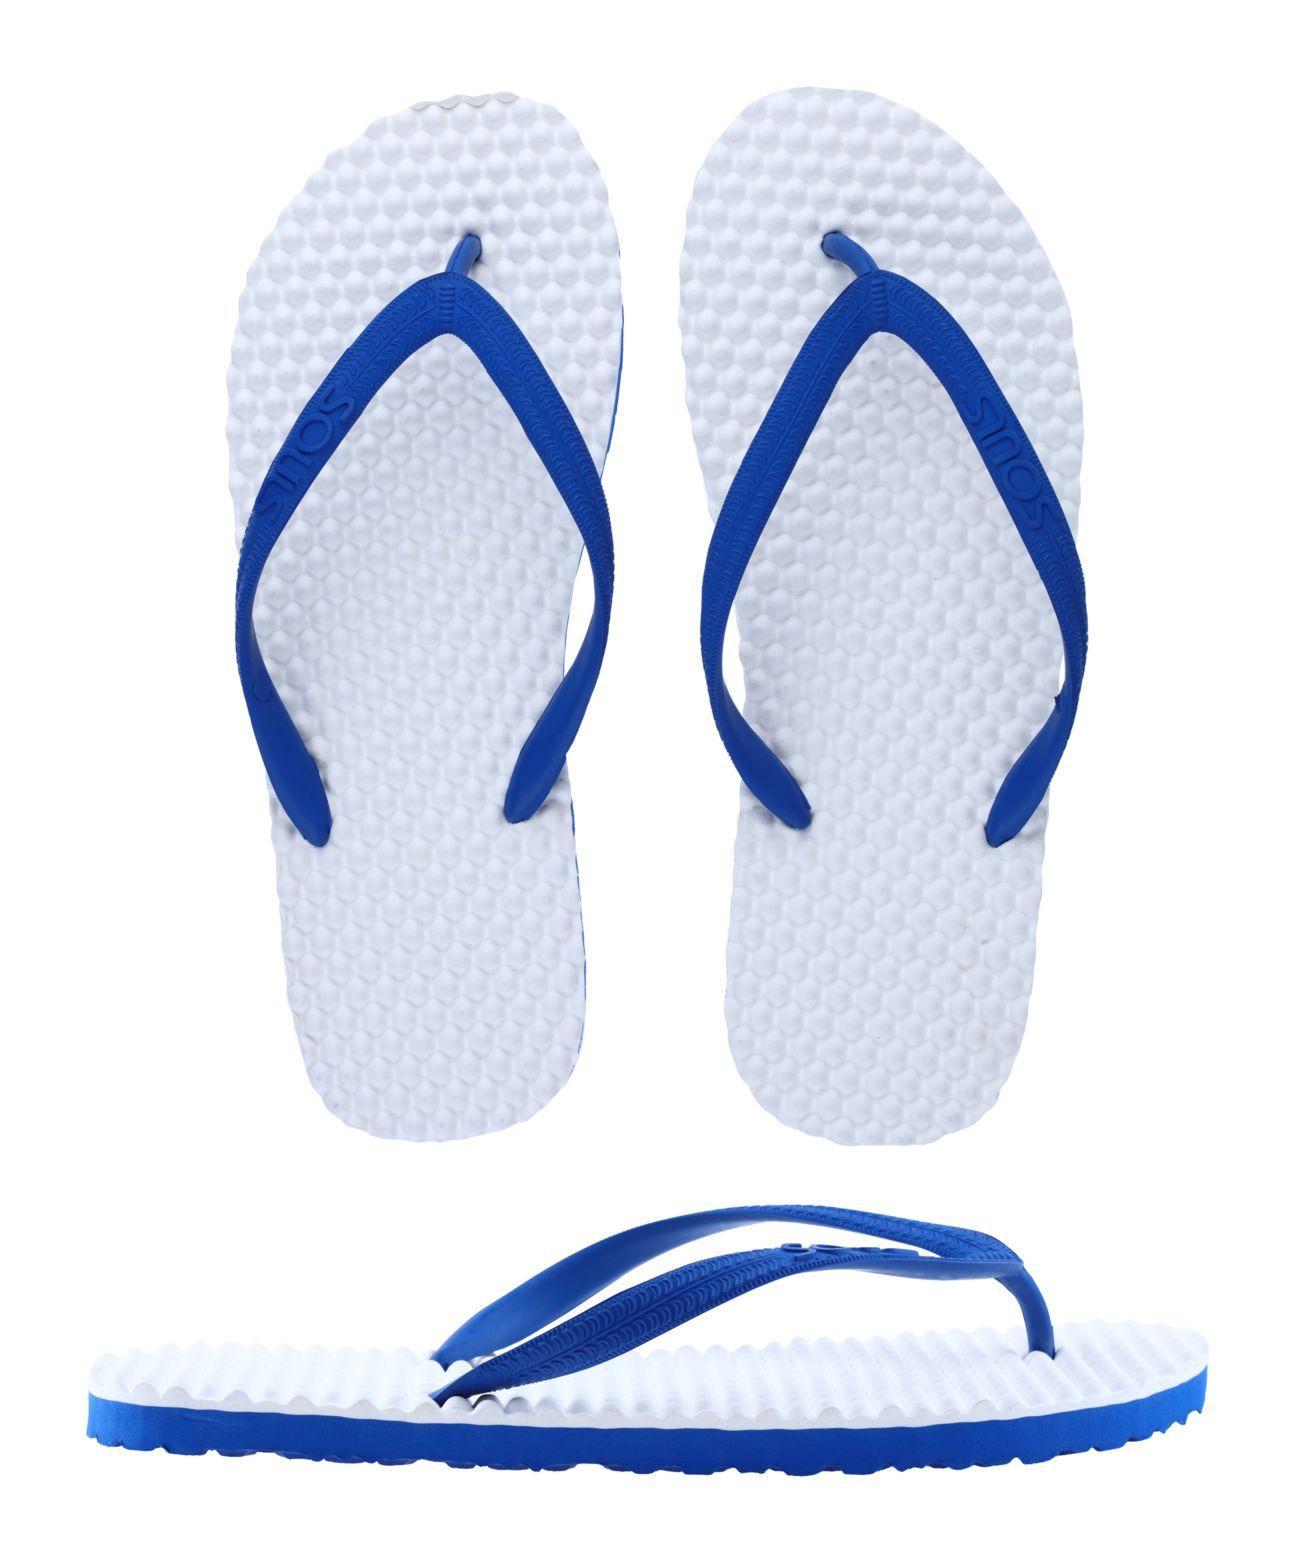 "SOULS Australian Thongs Zehentrenner Unisex Original Massage Noppen Sohle ""Holiday Blue"" Sandale Wellness Badeschuhe"